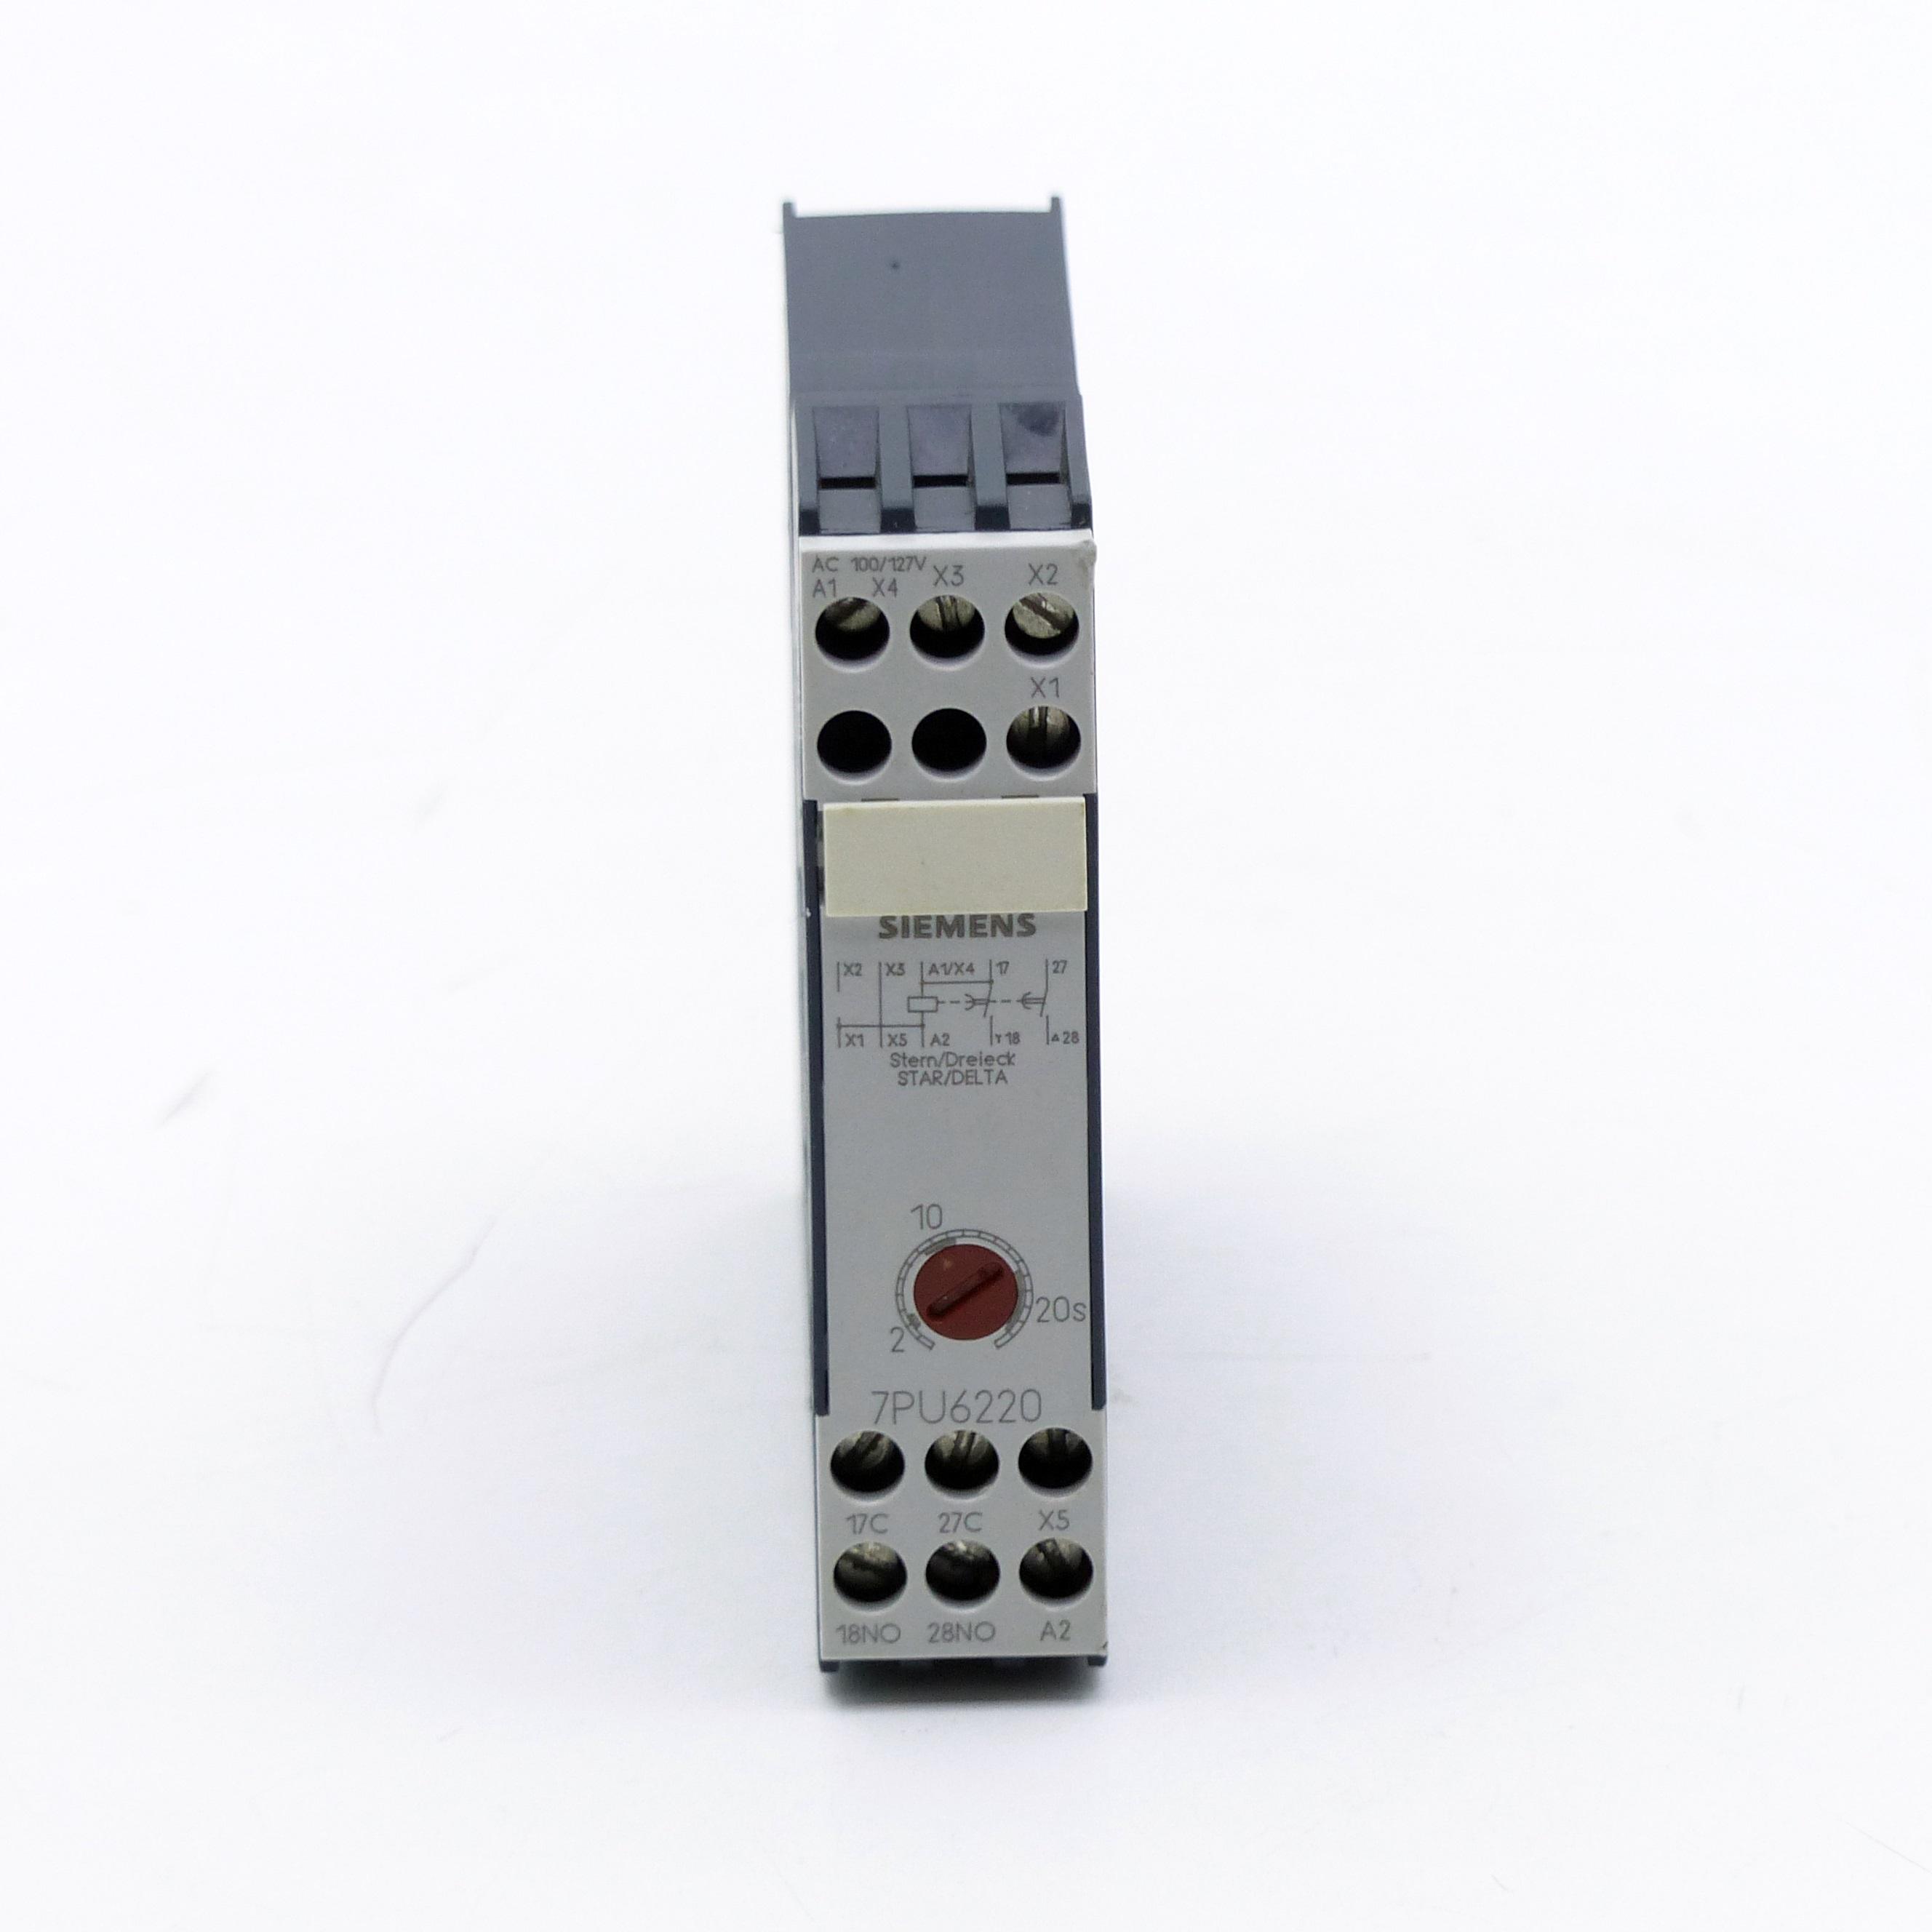 7PU6220-1